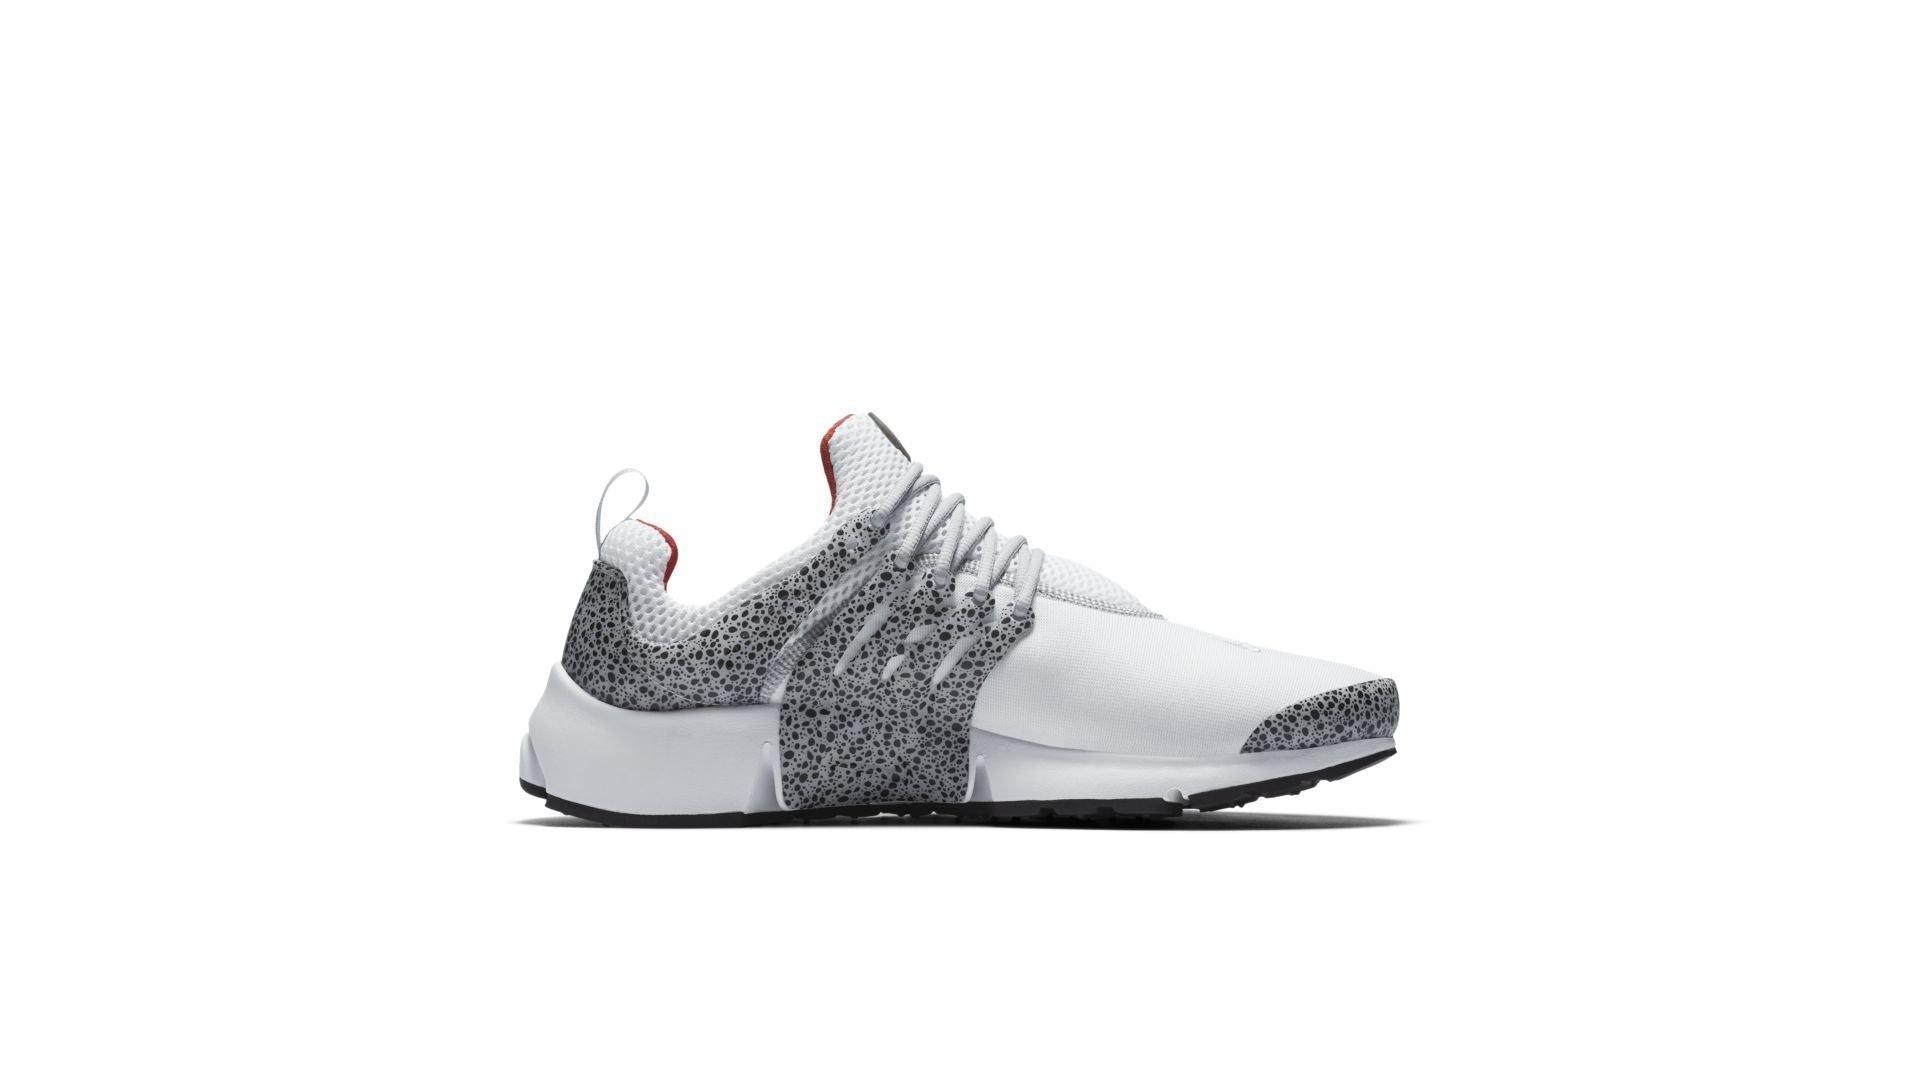 Nike Air Presto Safari Pure Platinum (886043-100)